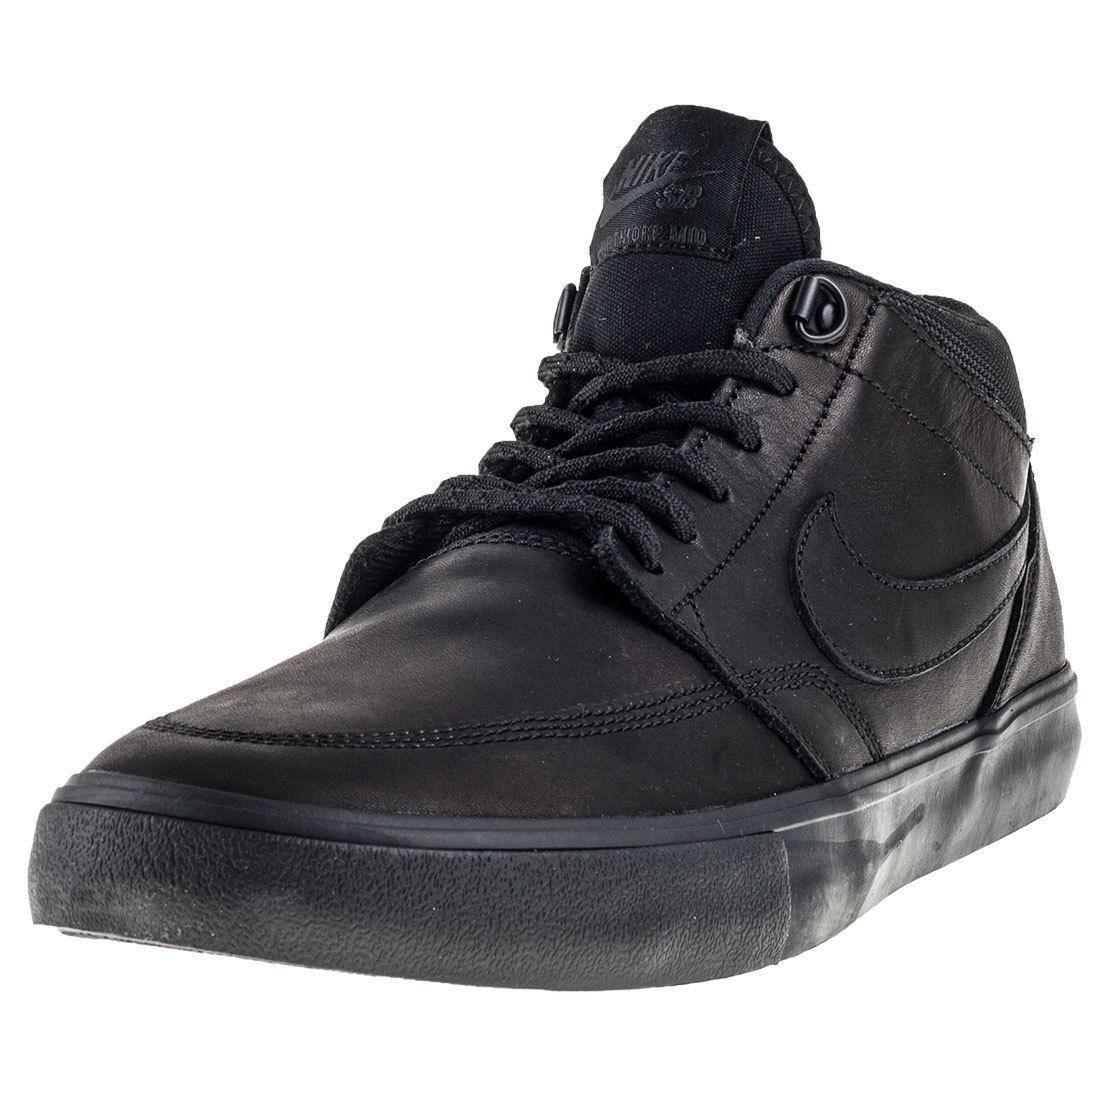 Nike Men's SB Portmore II Solar MD P Black/Anthracite Skate Shoe 11.5 MSRP: